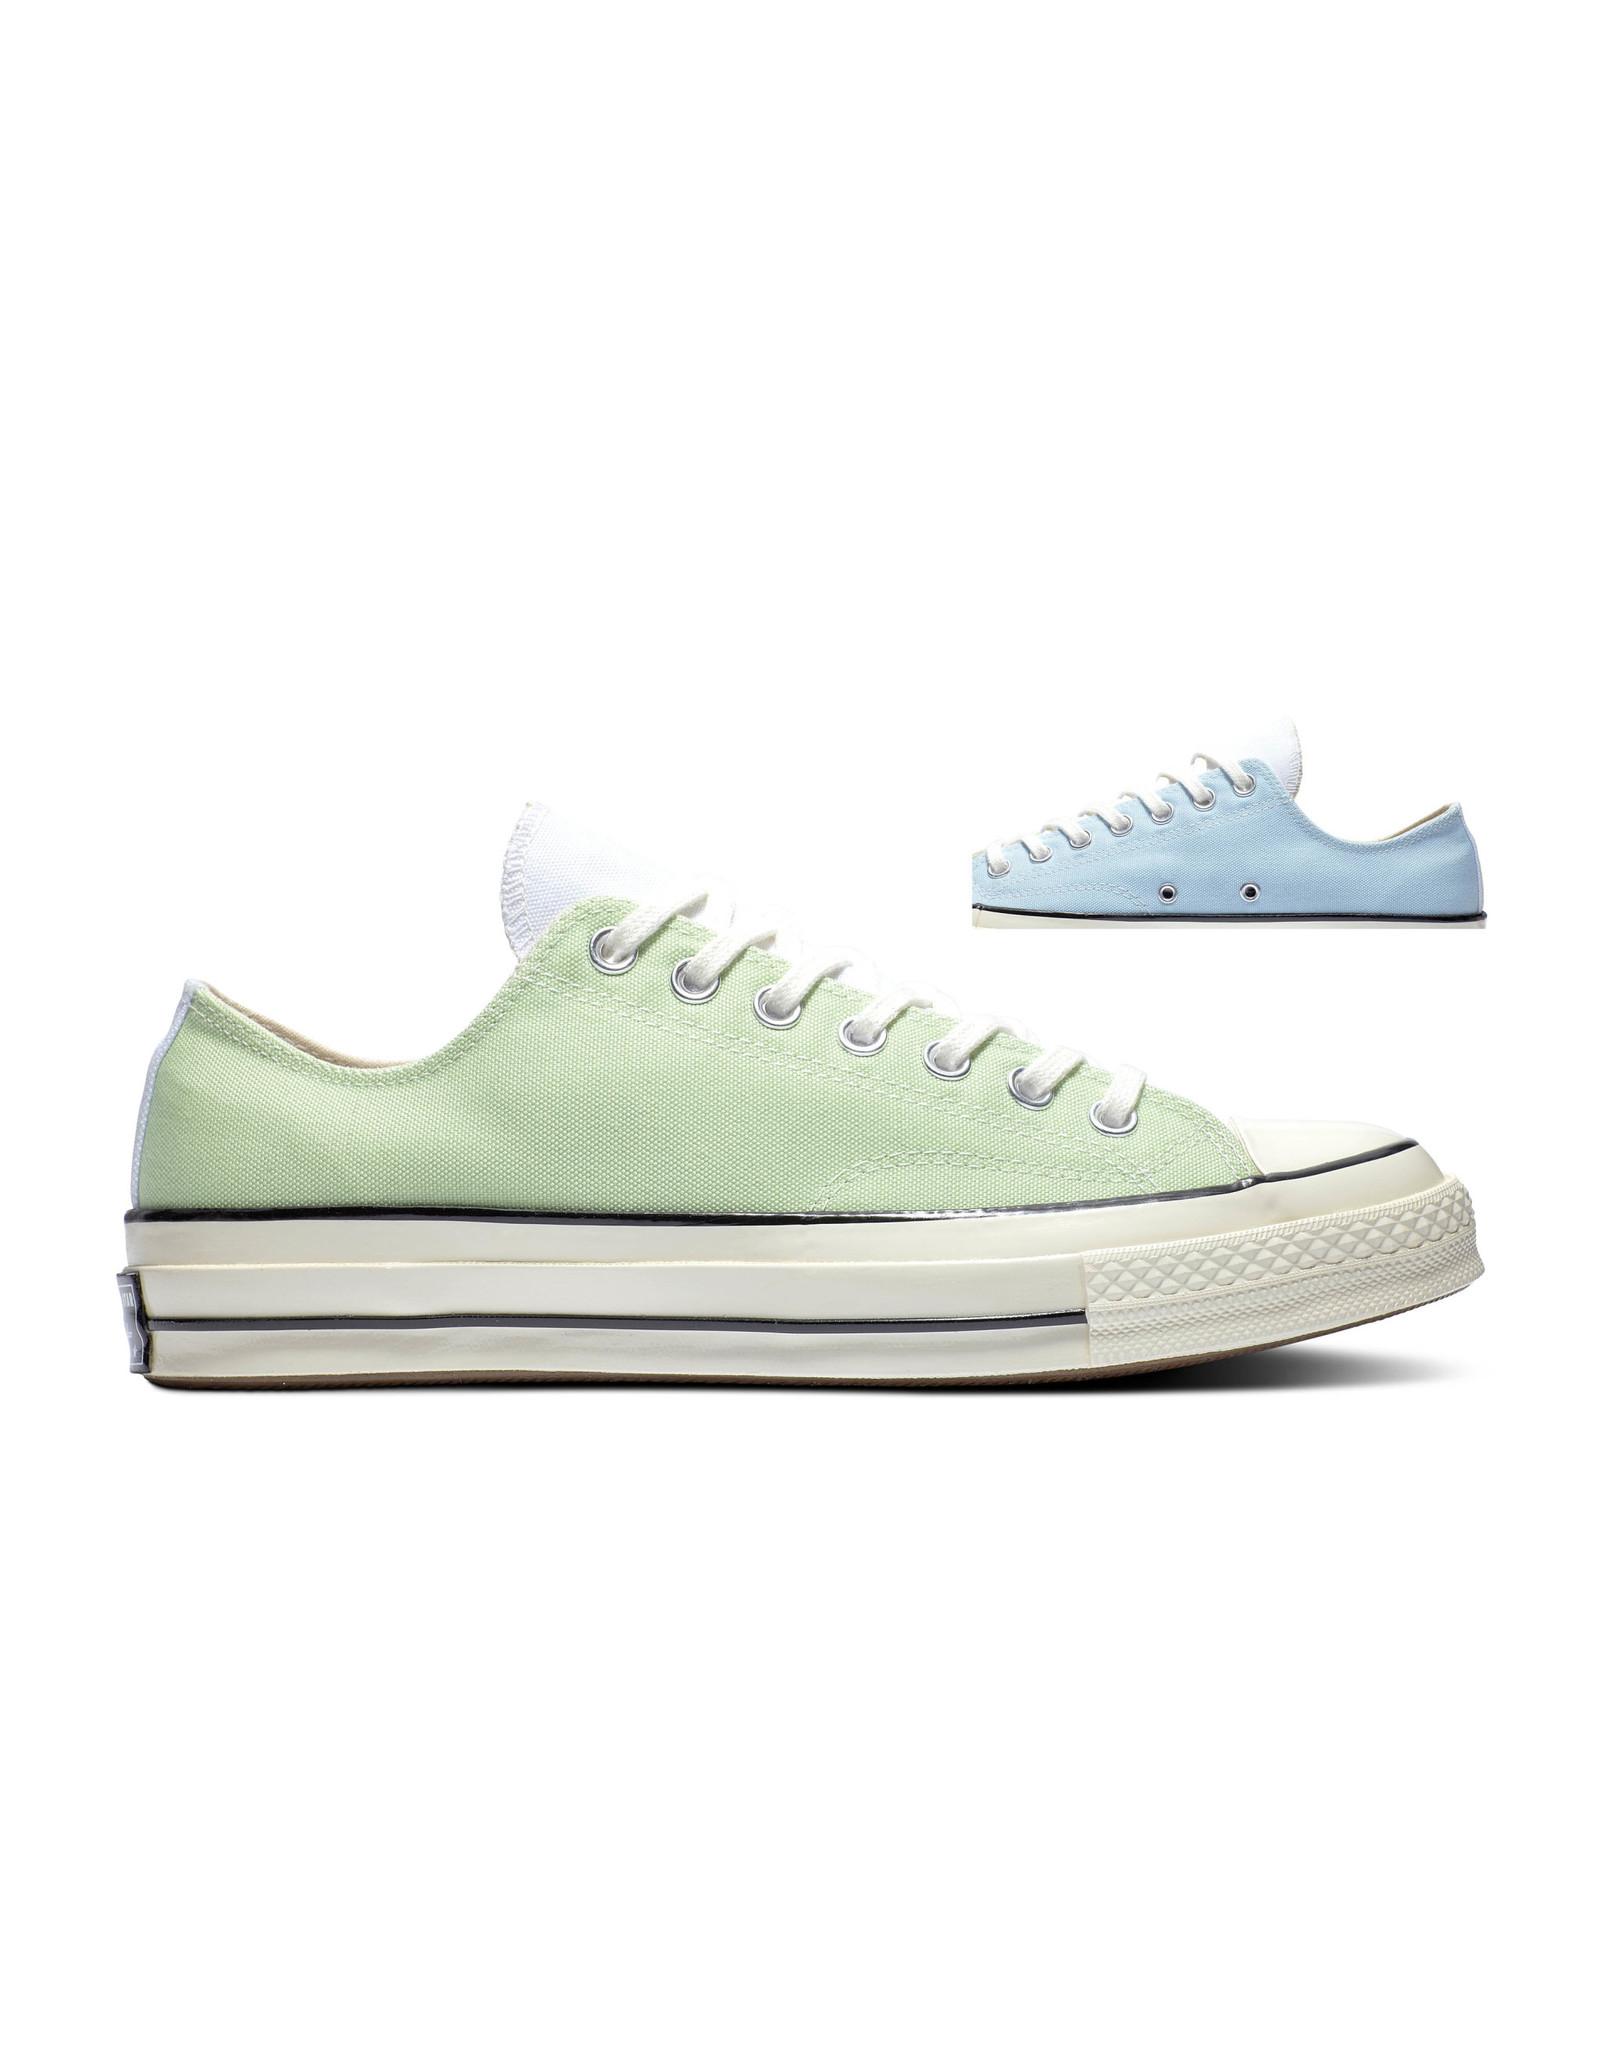 CONVERSE CHUCK 70 OX CHAMBRAY BLUE/SPRING GREEN C170CHAX-170959C